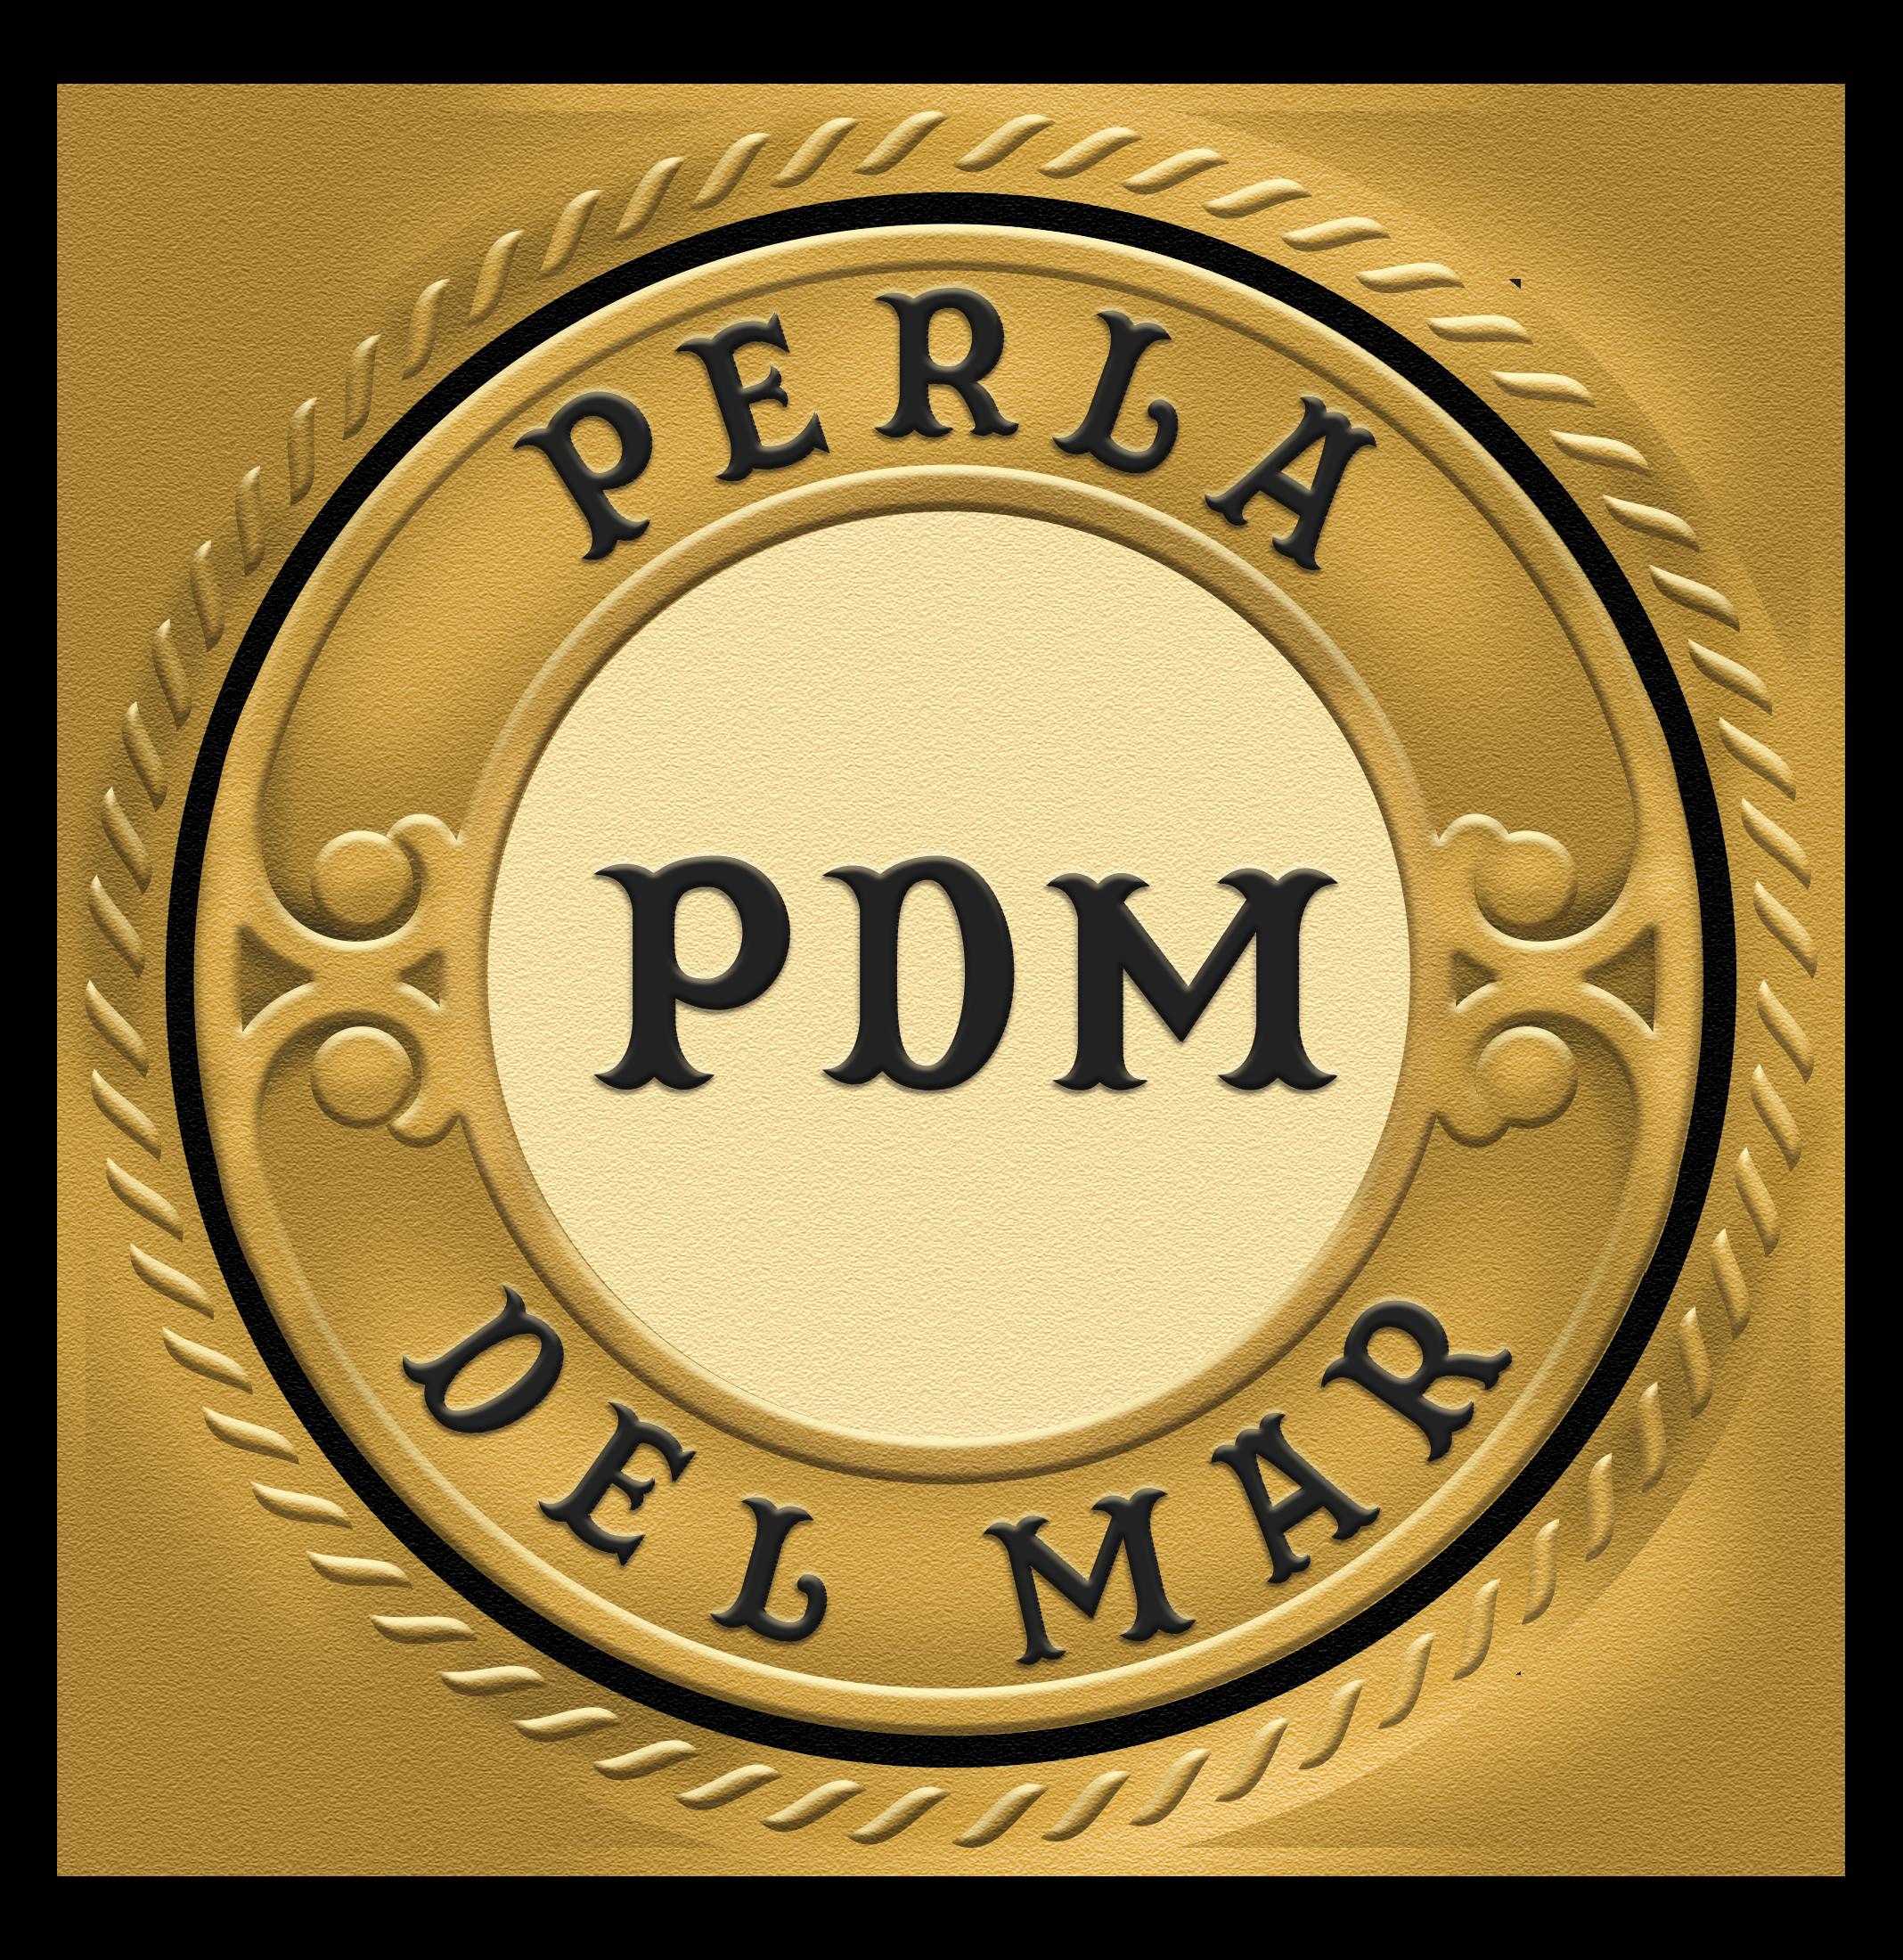 perla del mar cigar logo